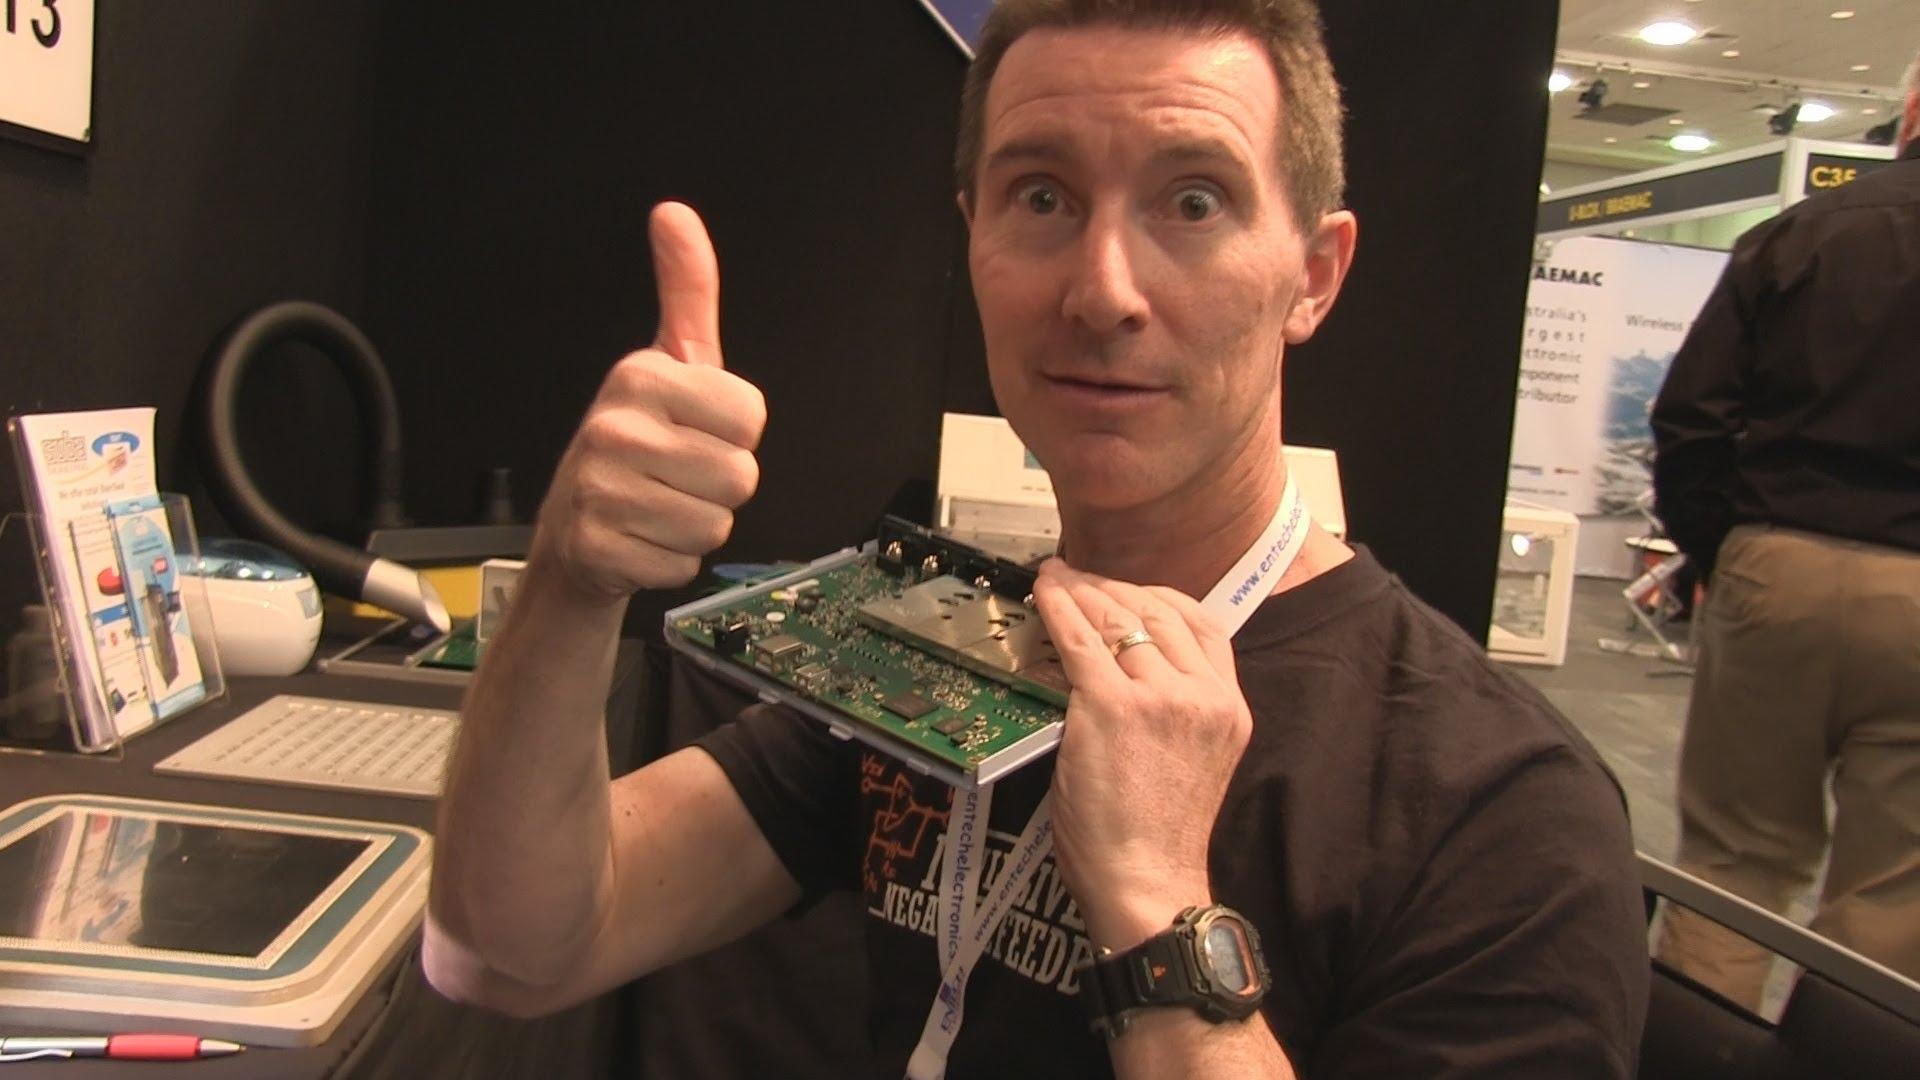 EEVblog #521 – Picoscope 5000 USB Oscilloscope Teardown